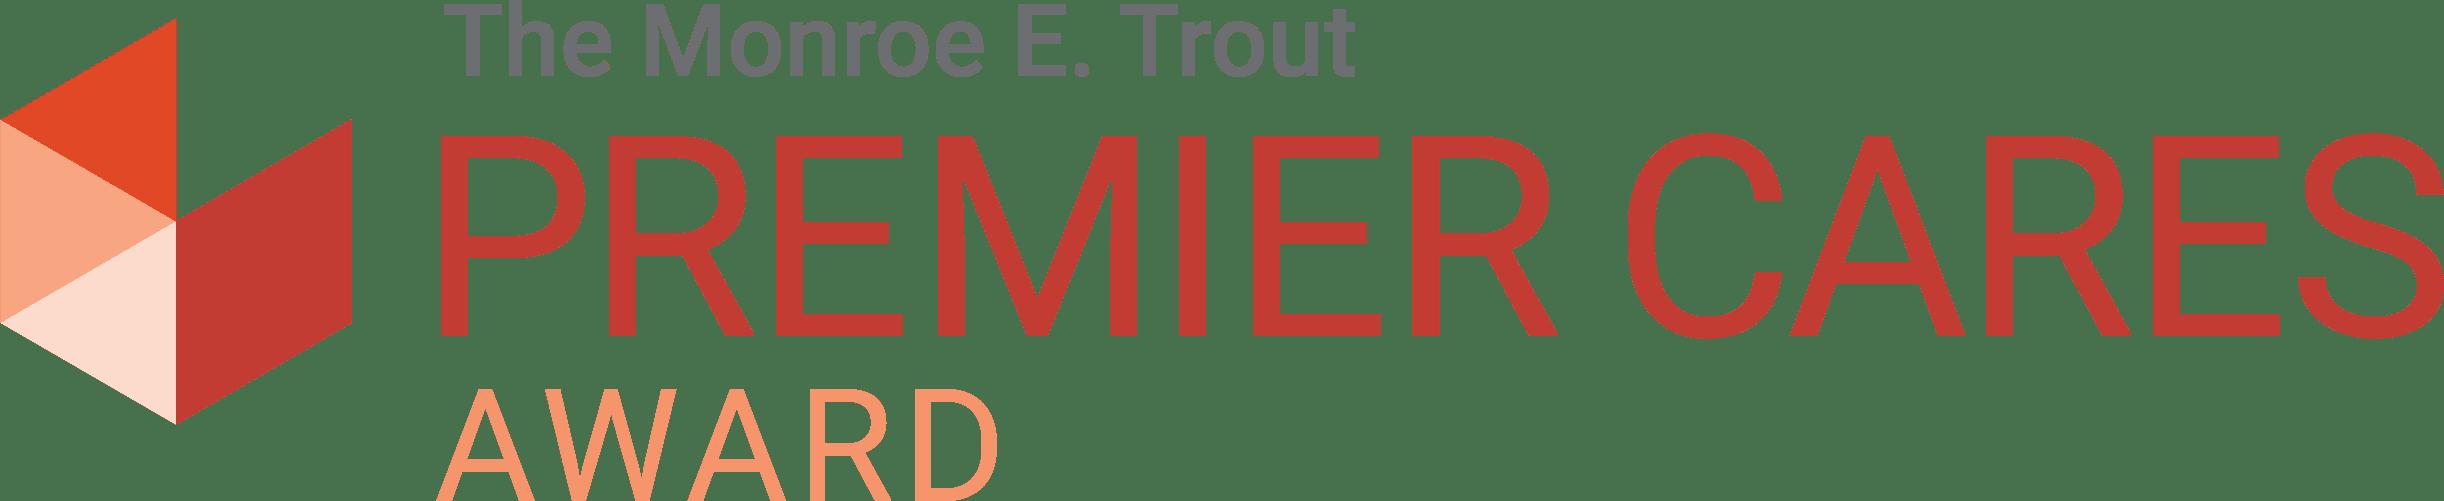 Press Release on Premierinc.com and logo